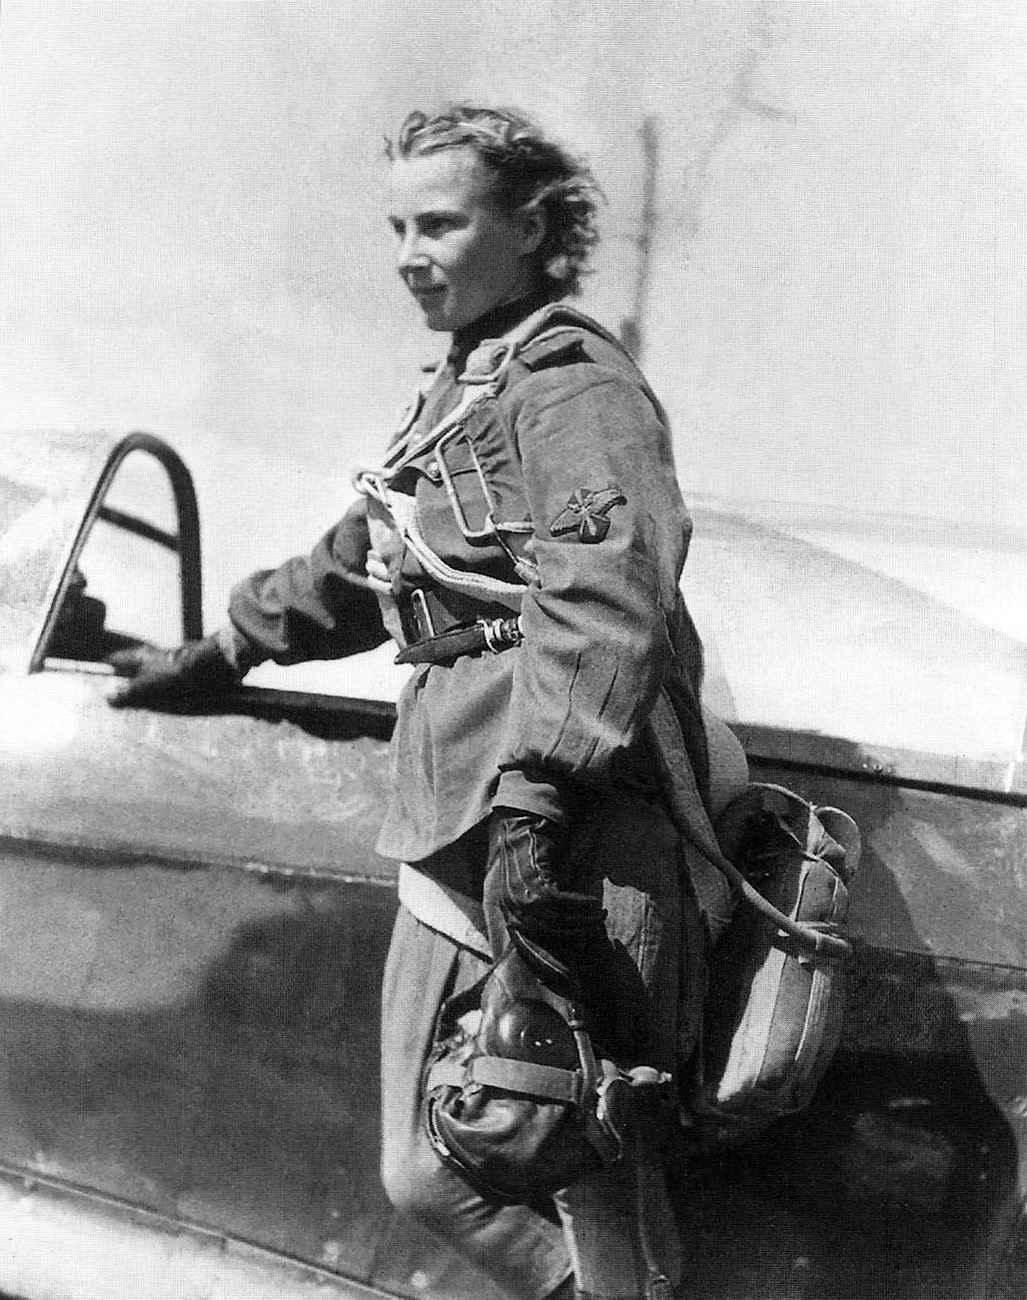 Младший лейтенант Лидия Литвяк